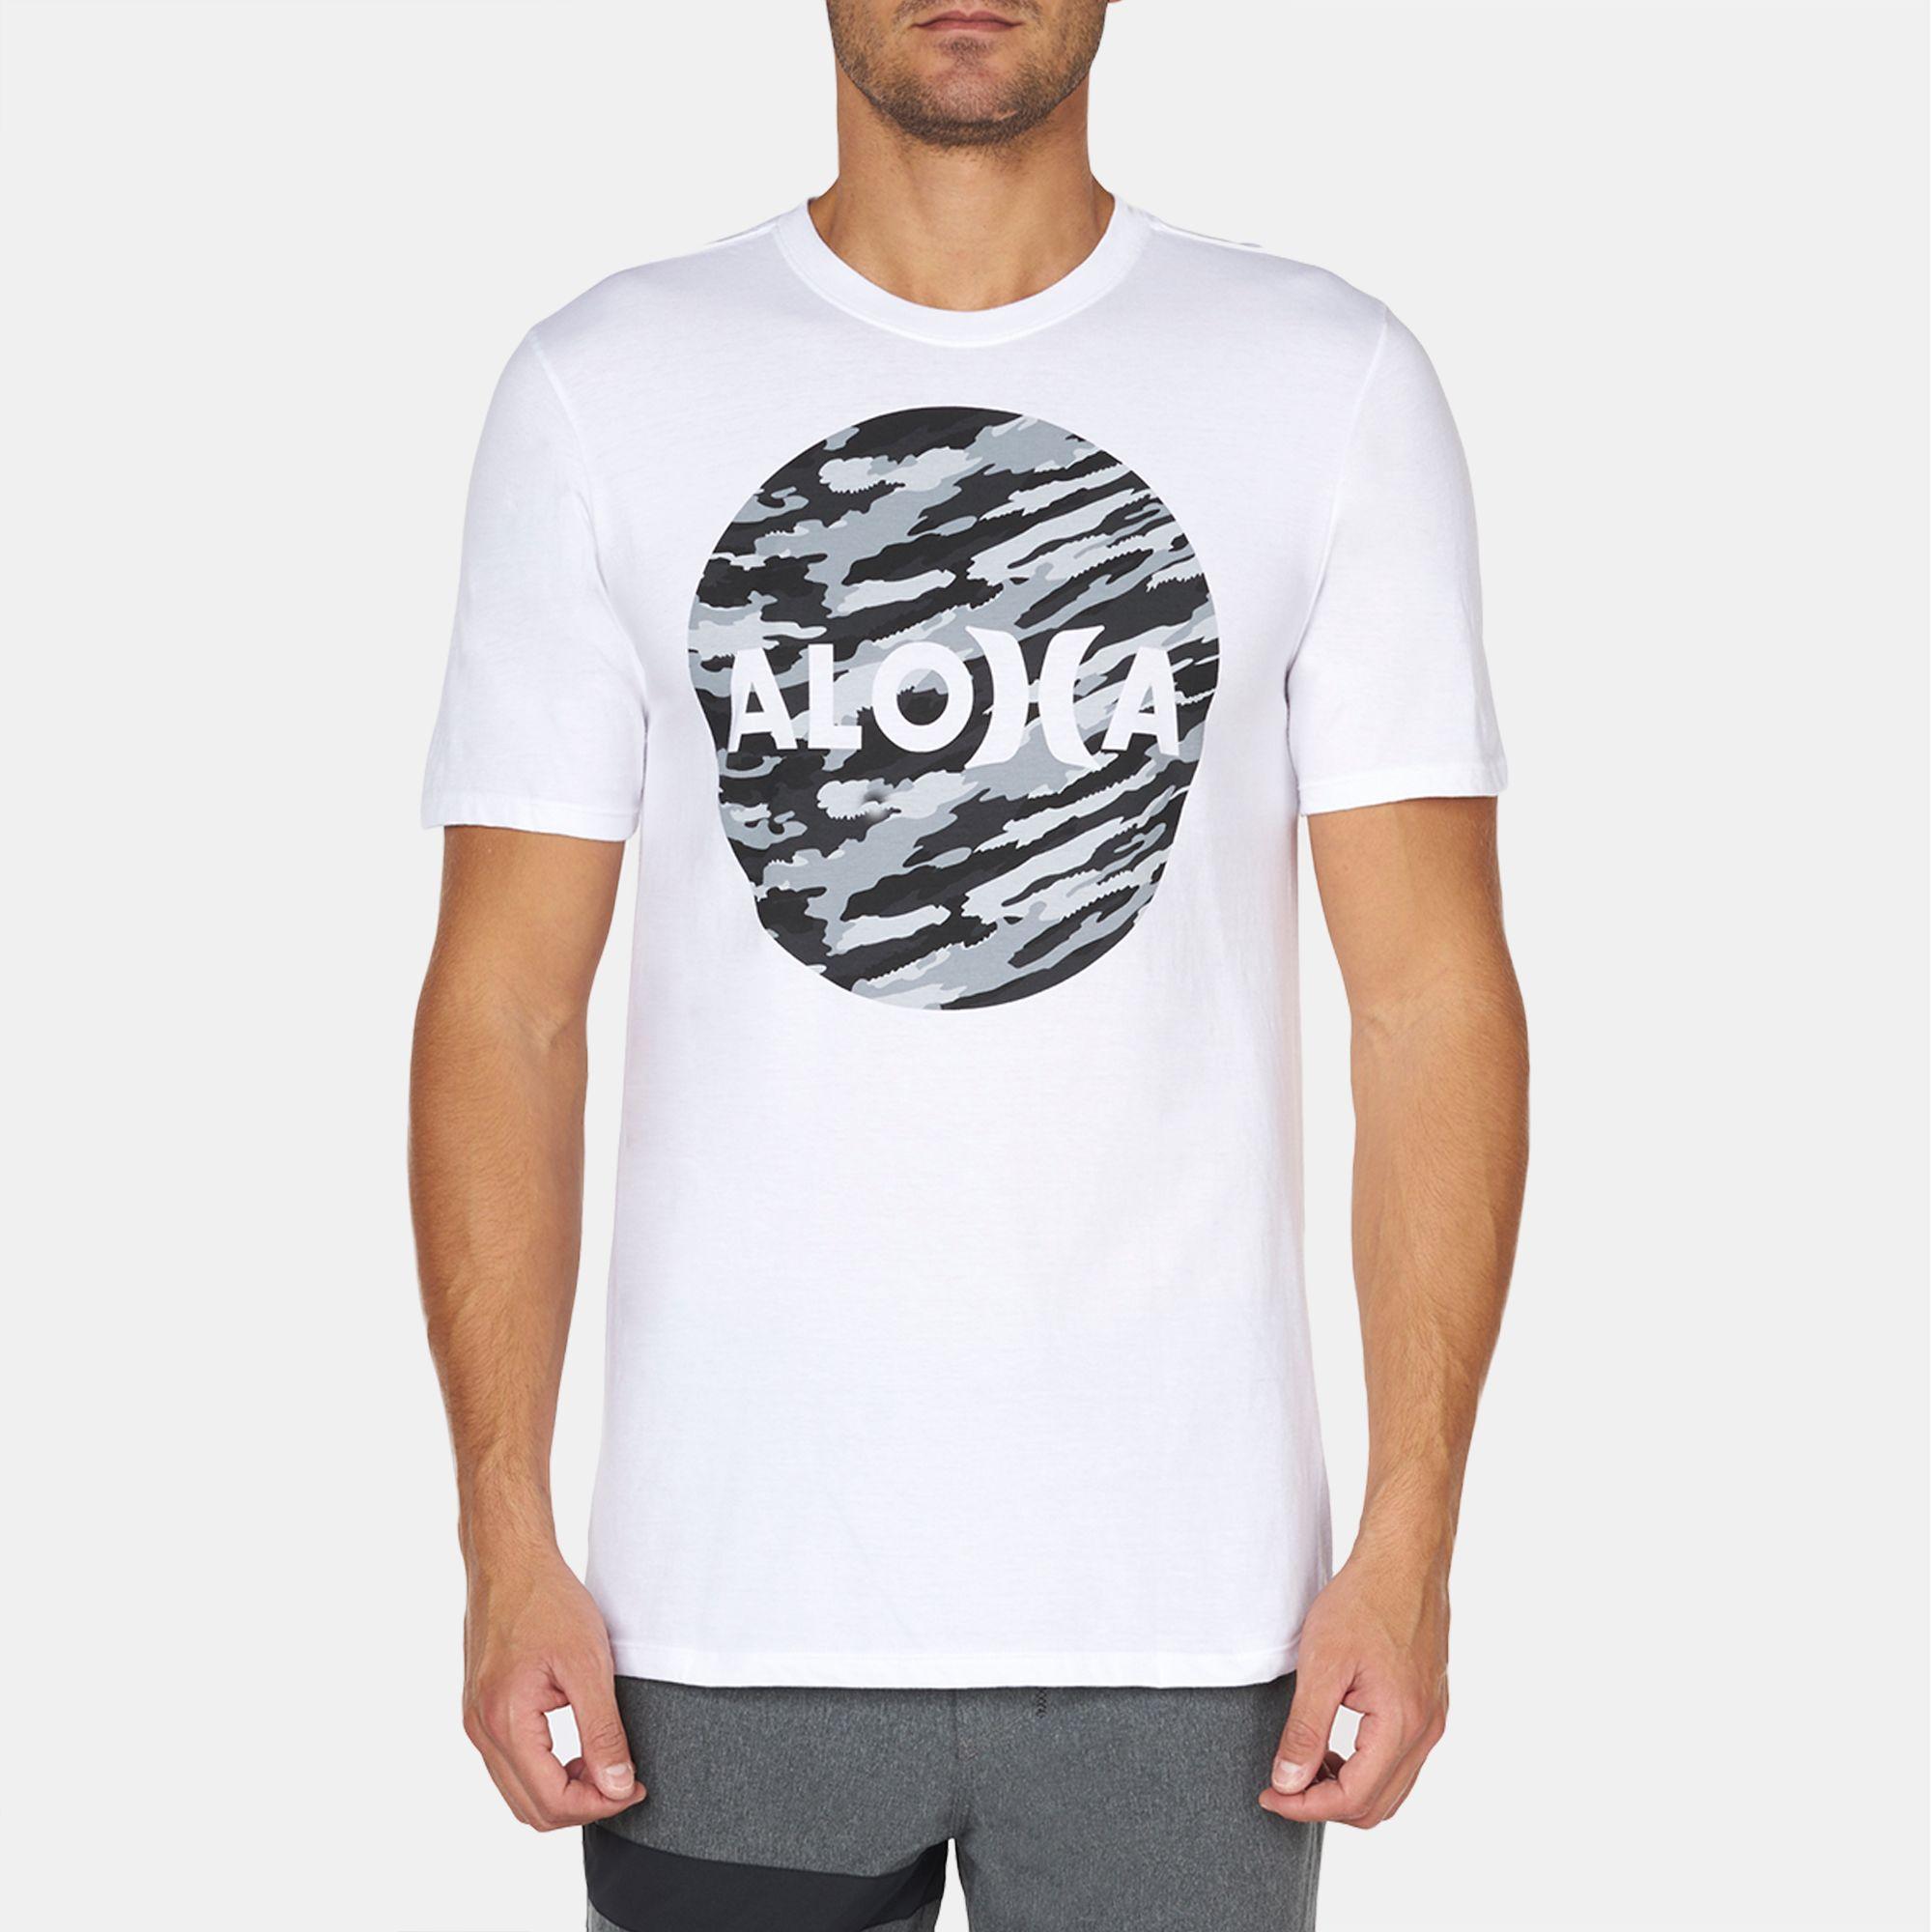 6f2a17d2cb Shop White Hurley JJF Aloha Push Through T-Shirt for Mens by Hurley ...